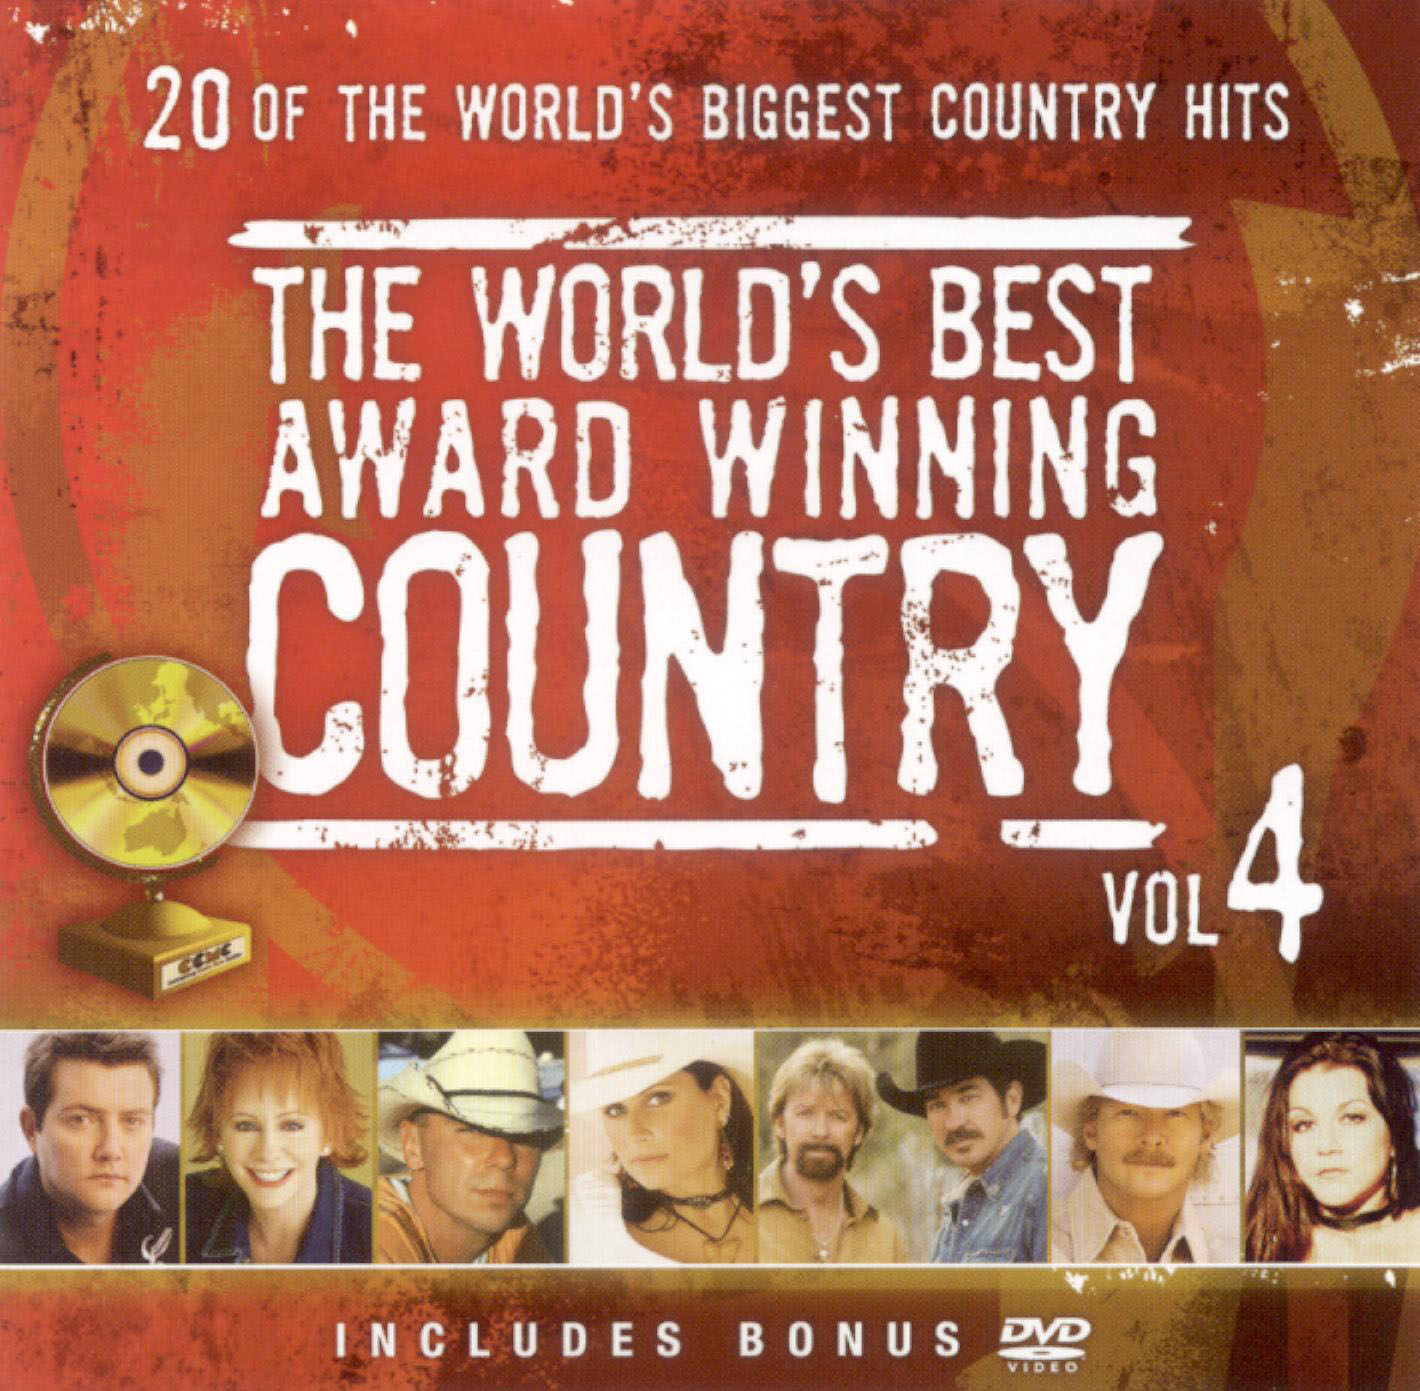 World's Best Award Winning Country, Vol. 4